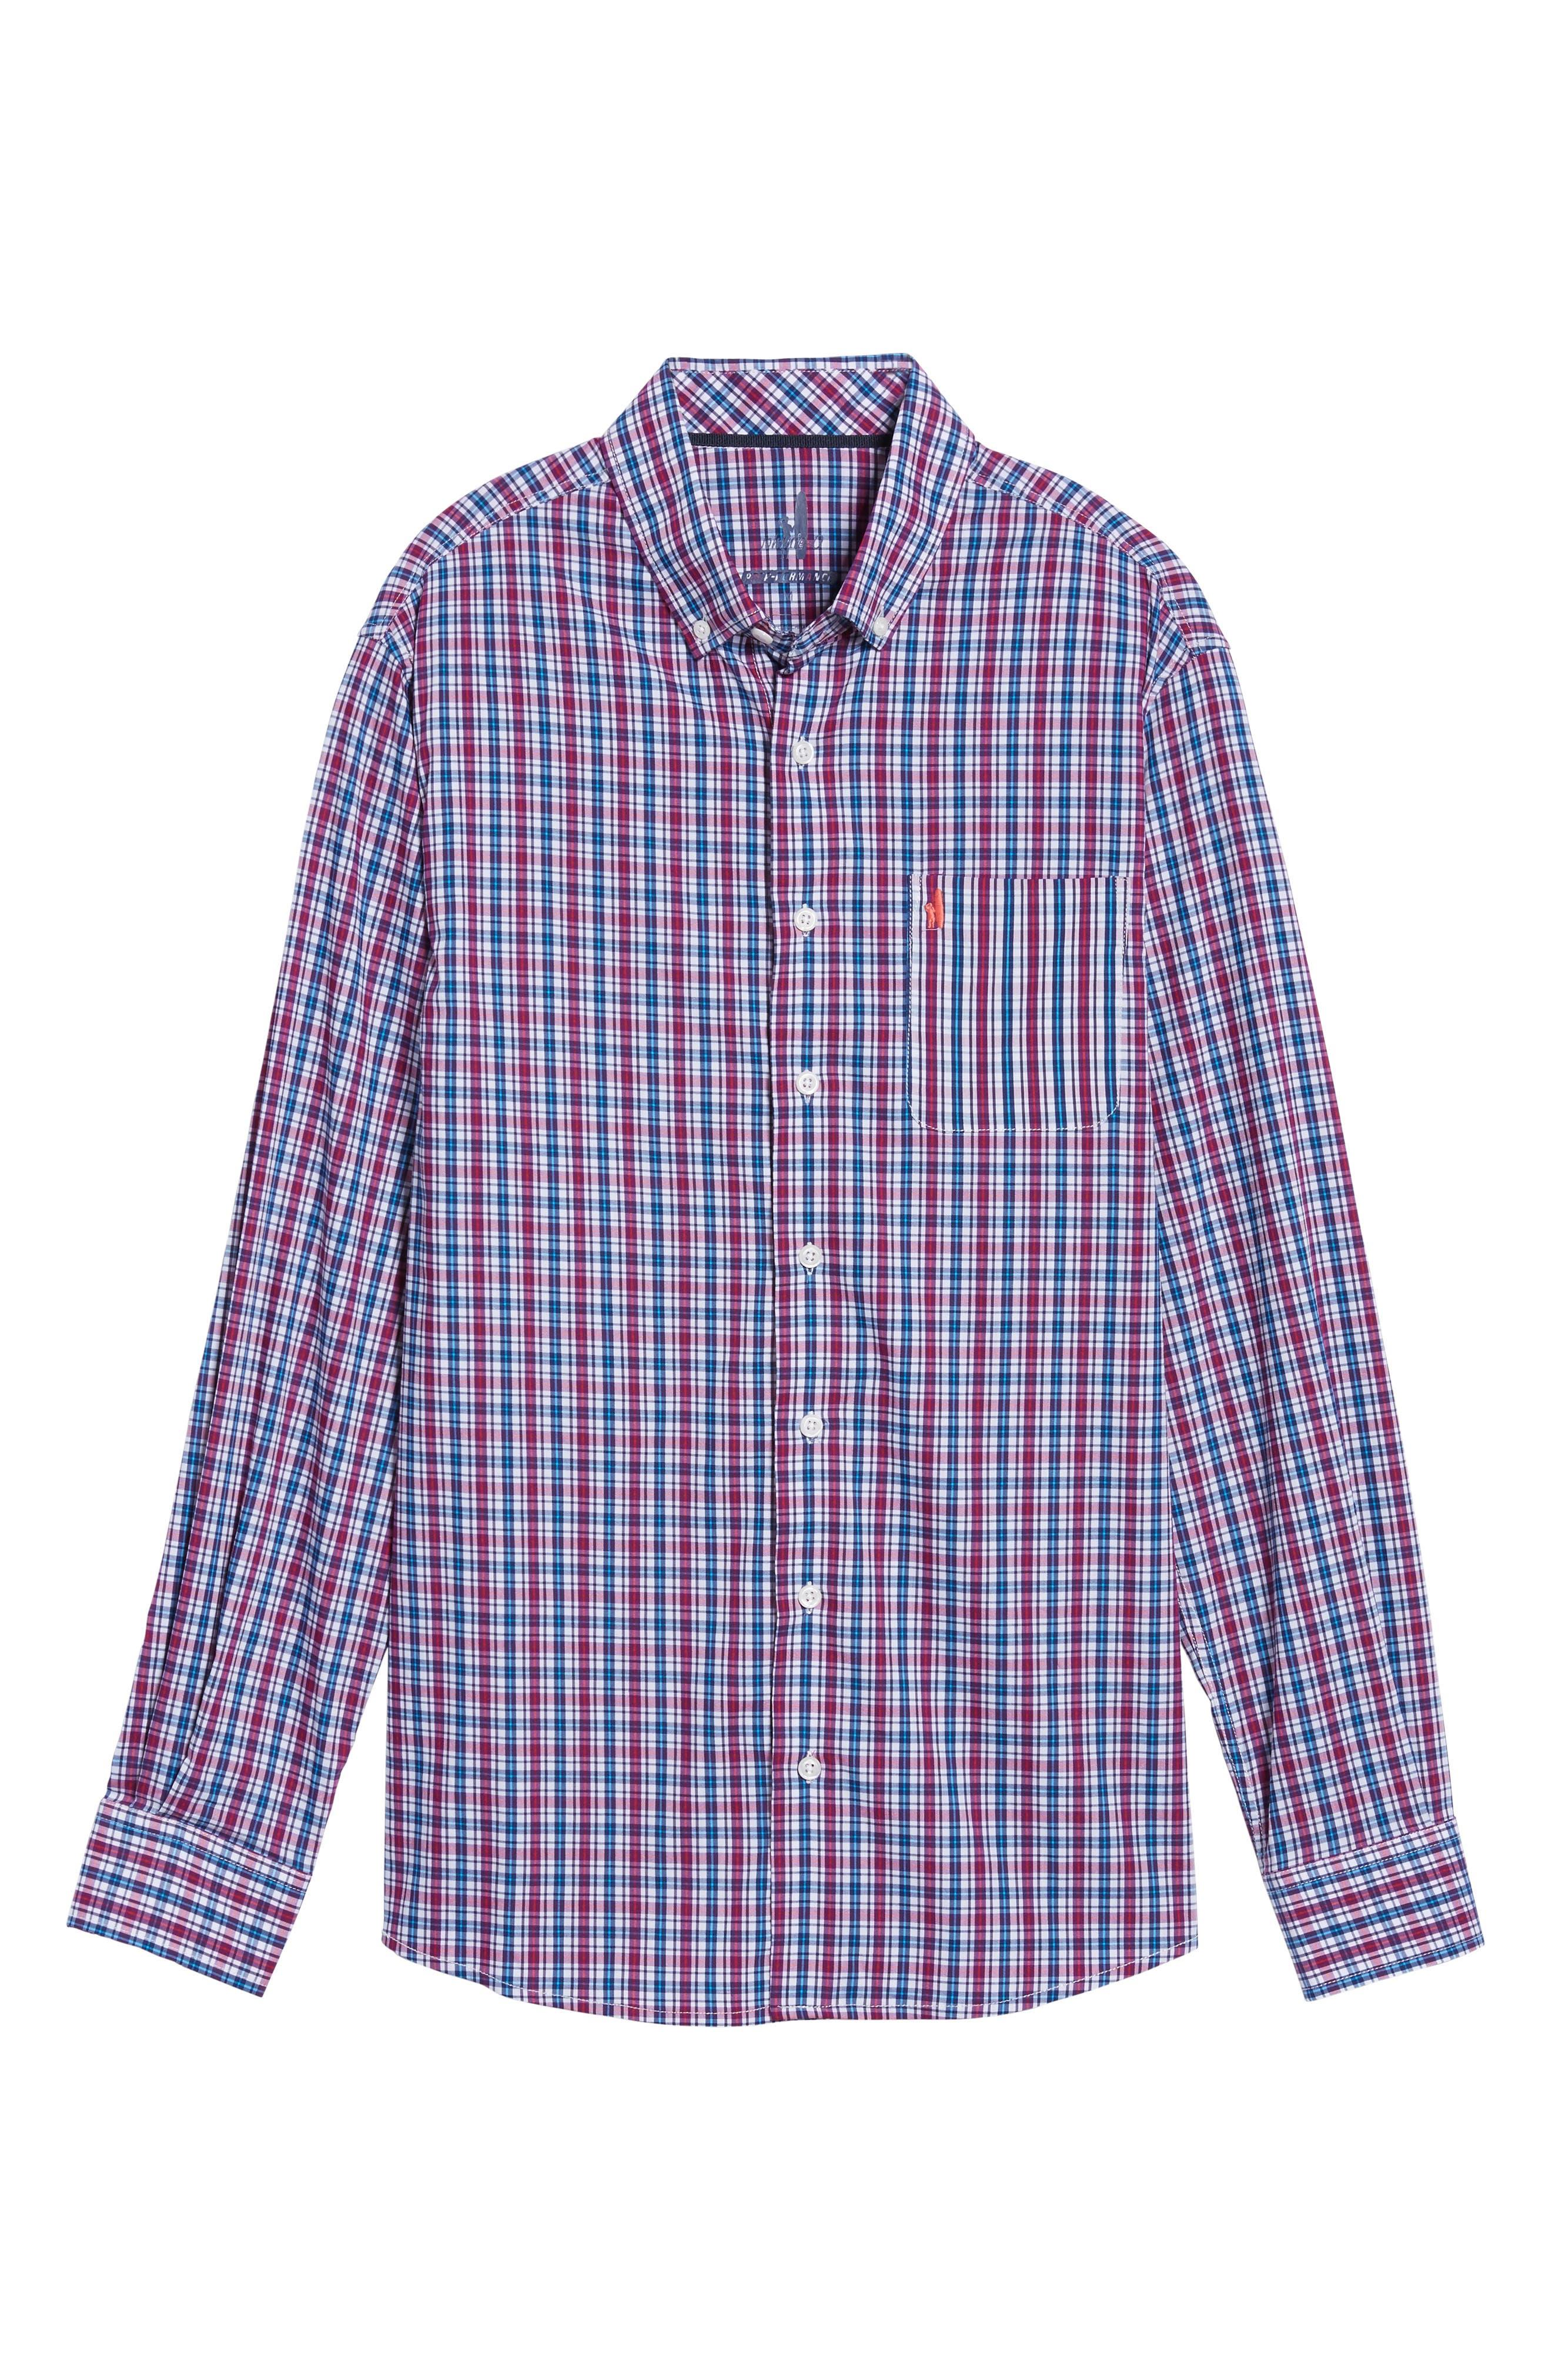 Parklan Check Sport Shirt,                             Alternate thumbnail 6, color,                             514